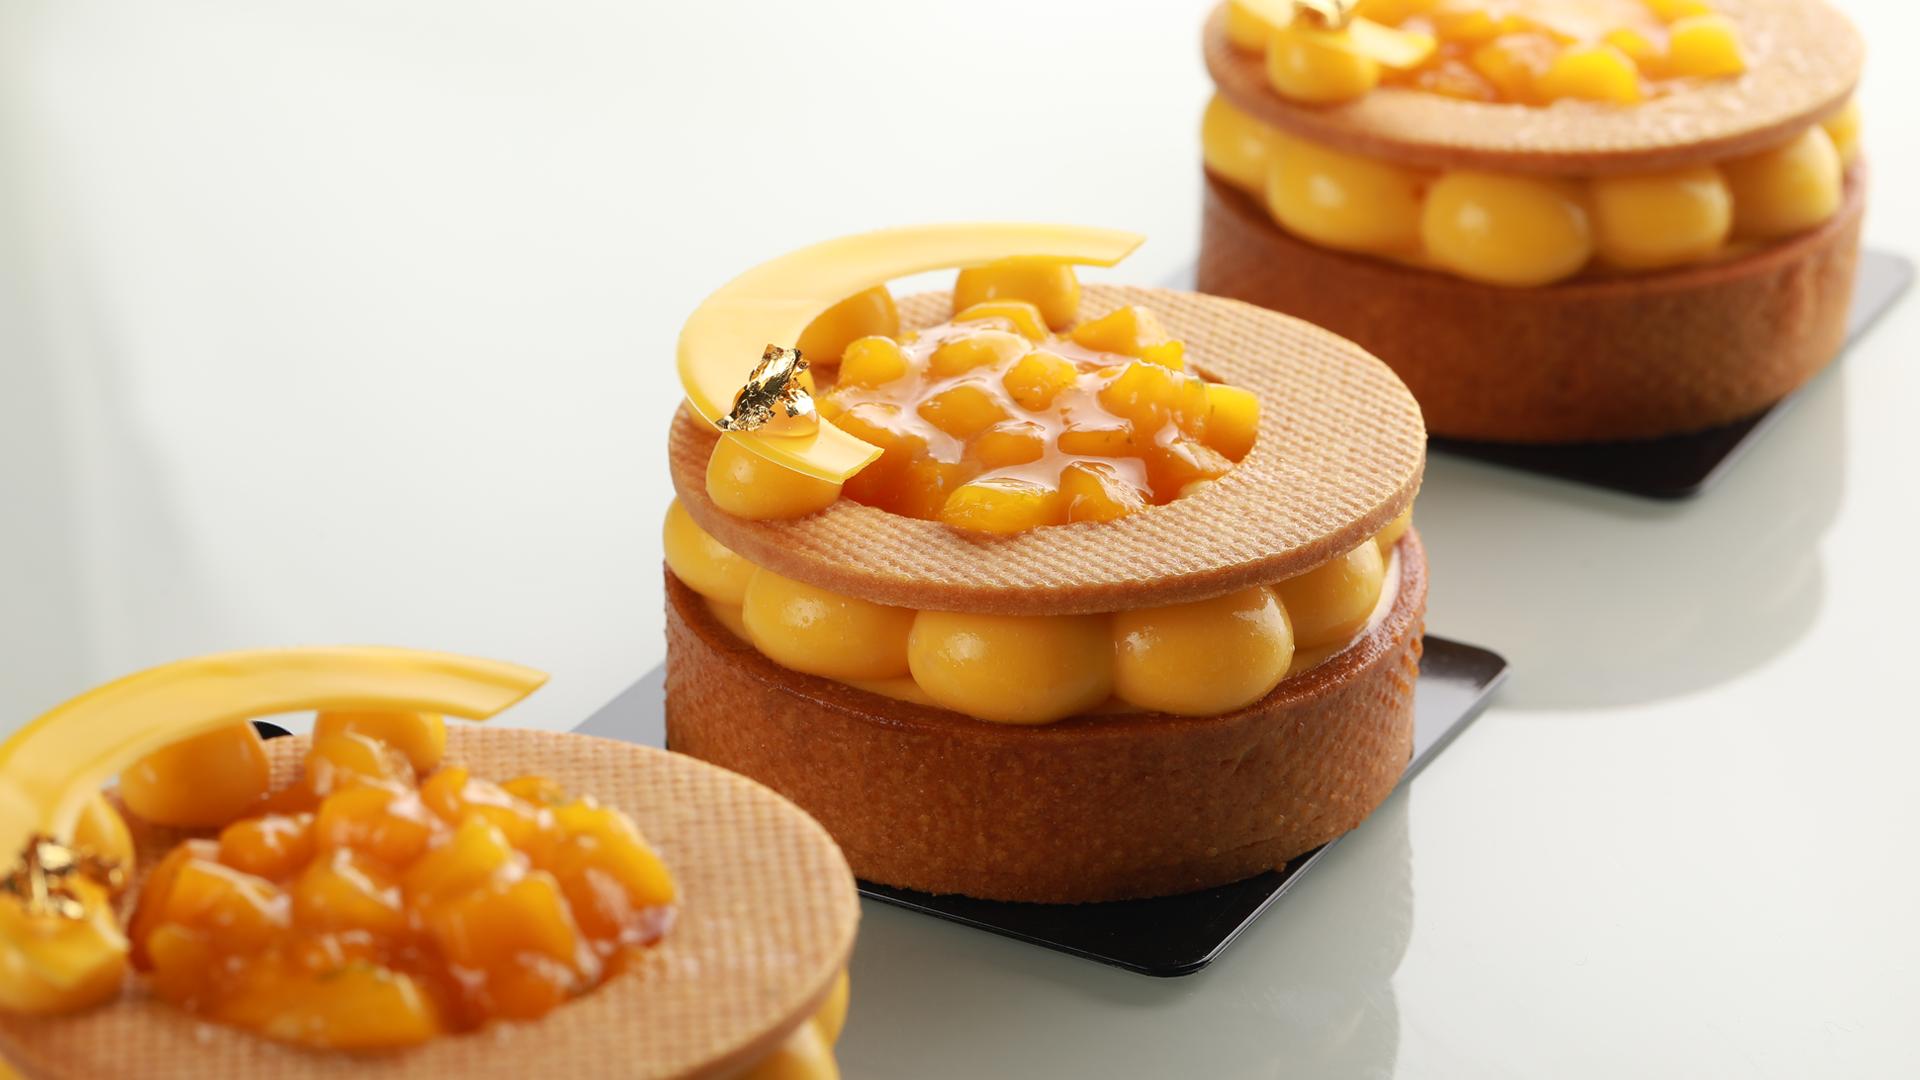 Almond passion fuit tart